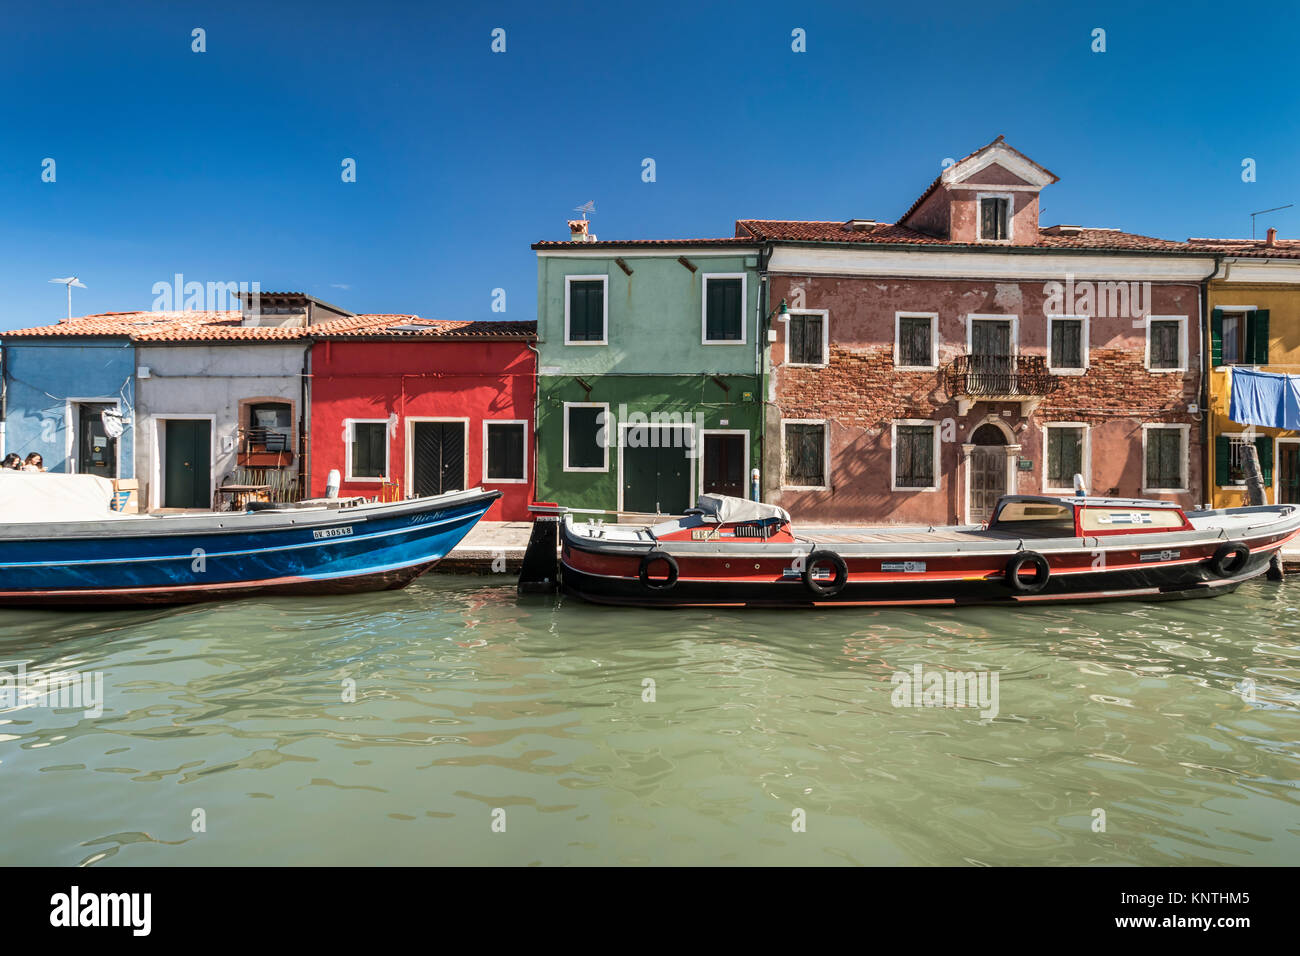 Die bunten Gebäude, Kanäle und Boote im venezianischen Dorf Burano, Venedig, Italien, Europa. Stockbild